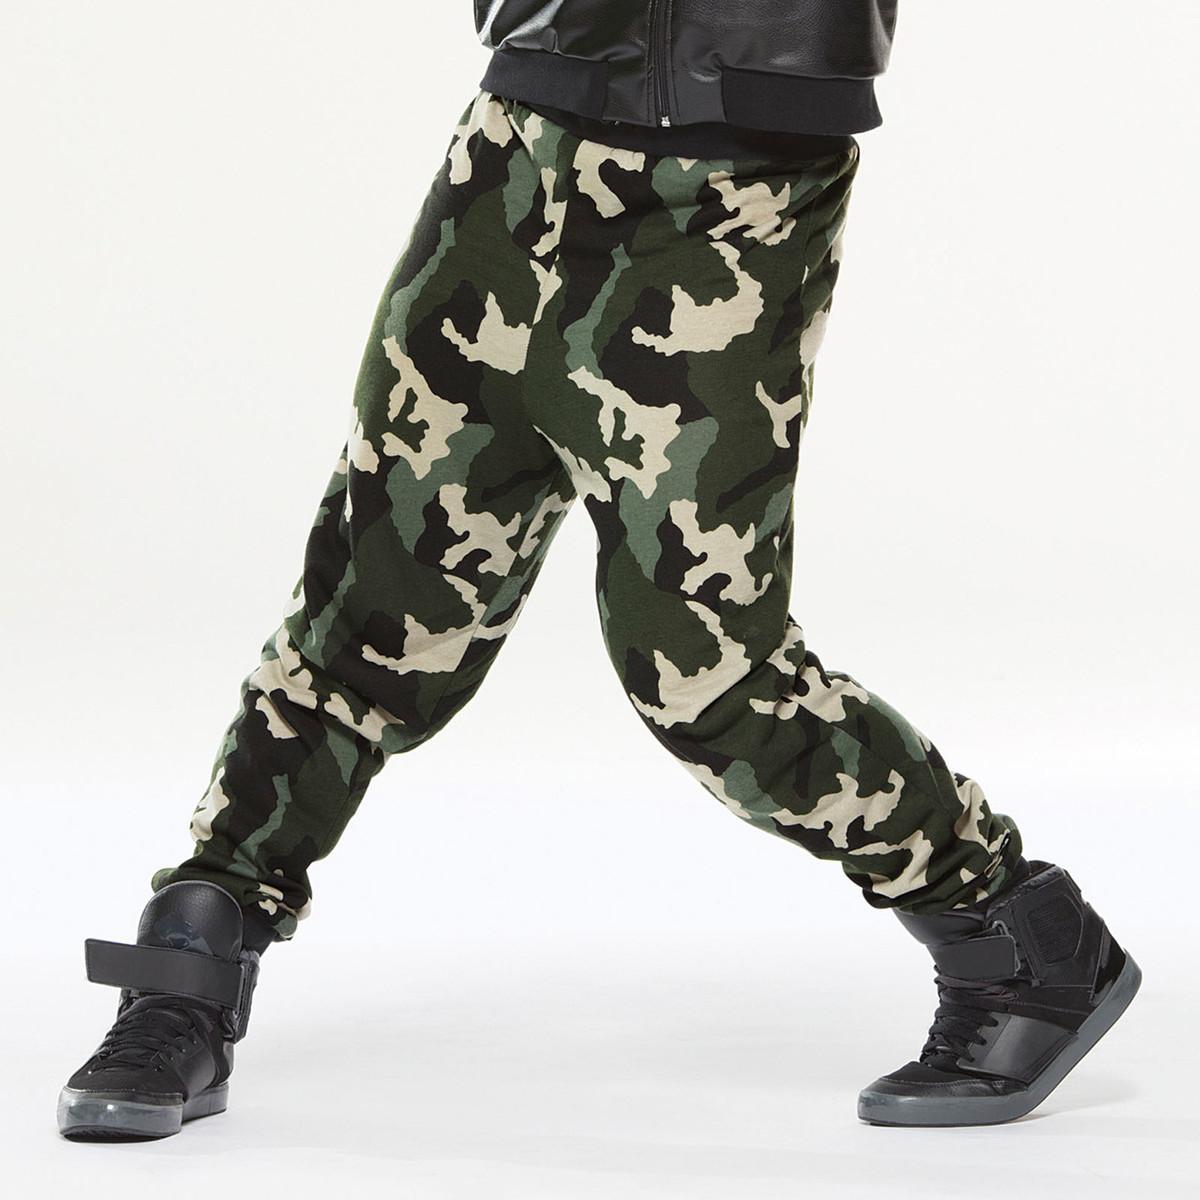 RENEGADE PANTS